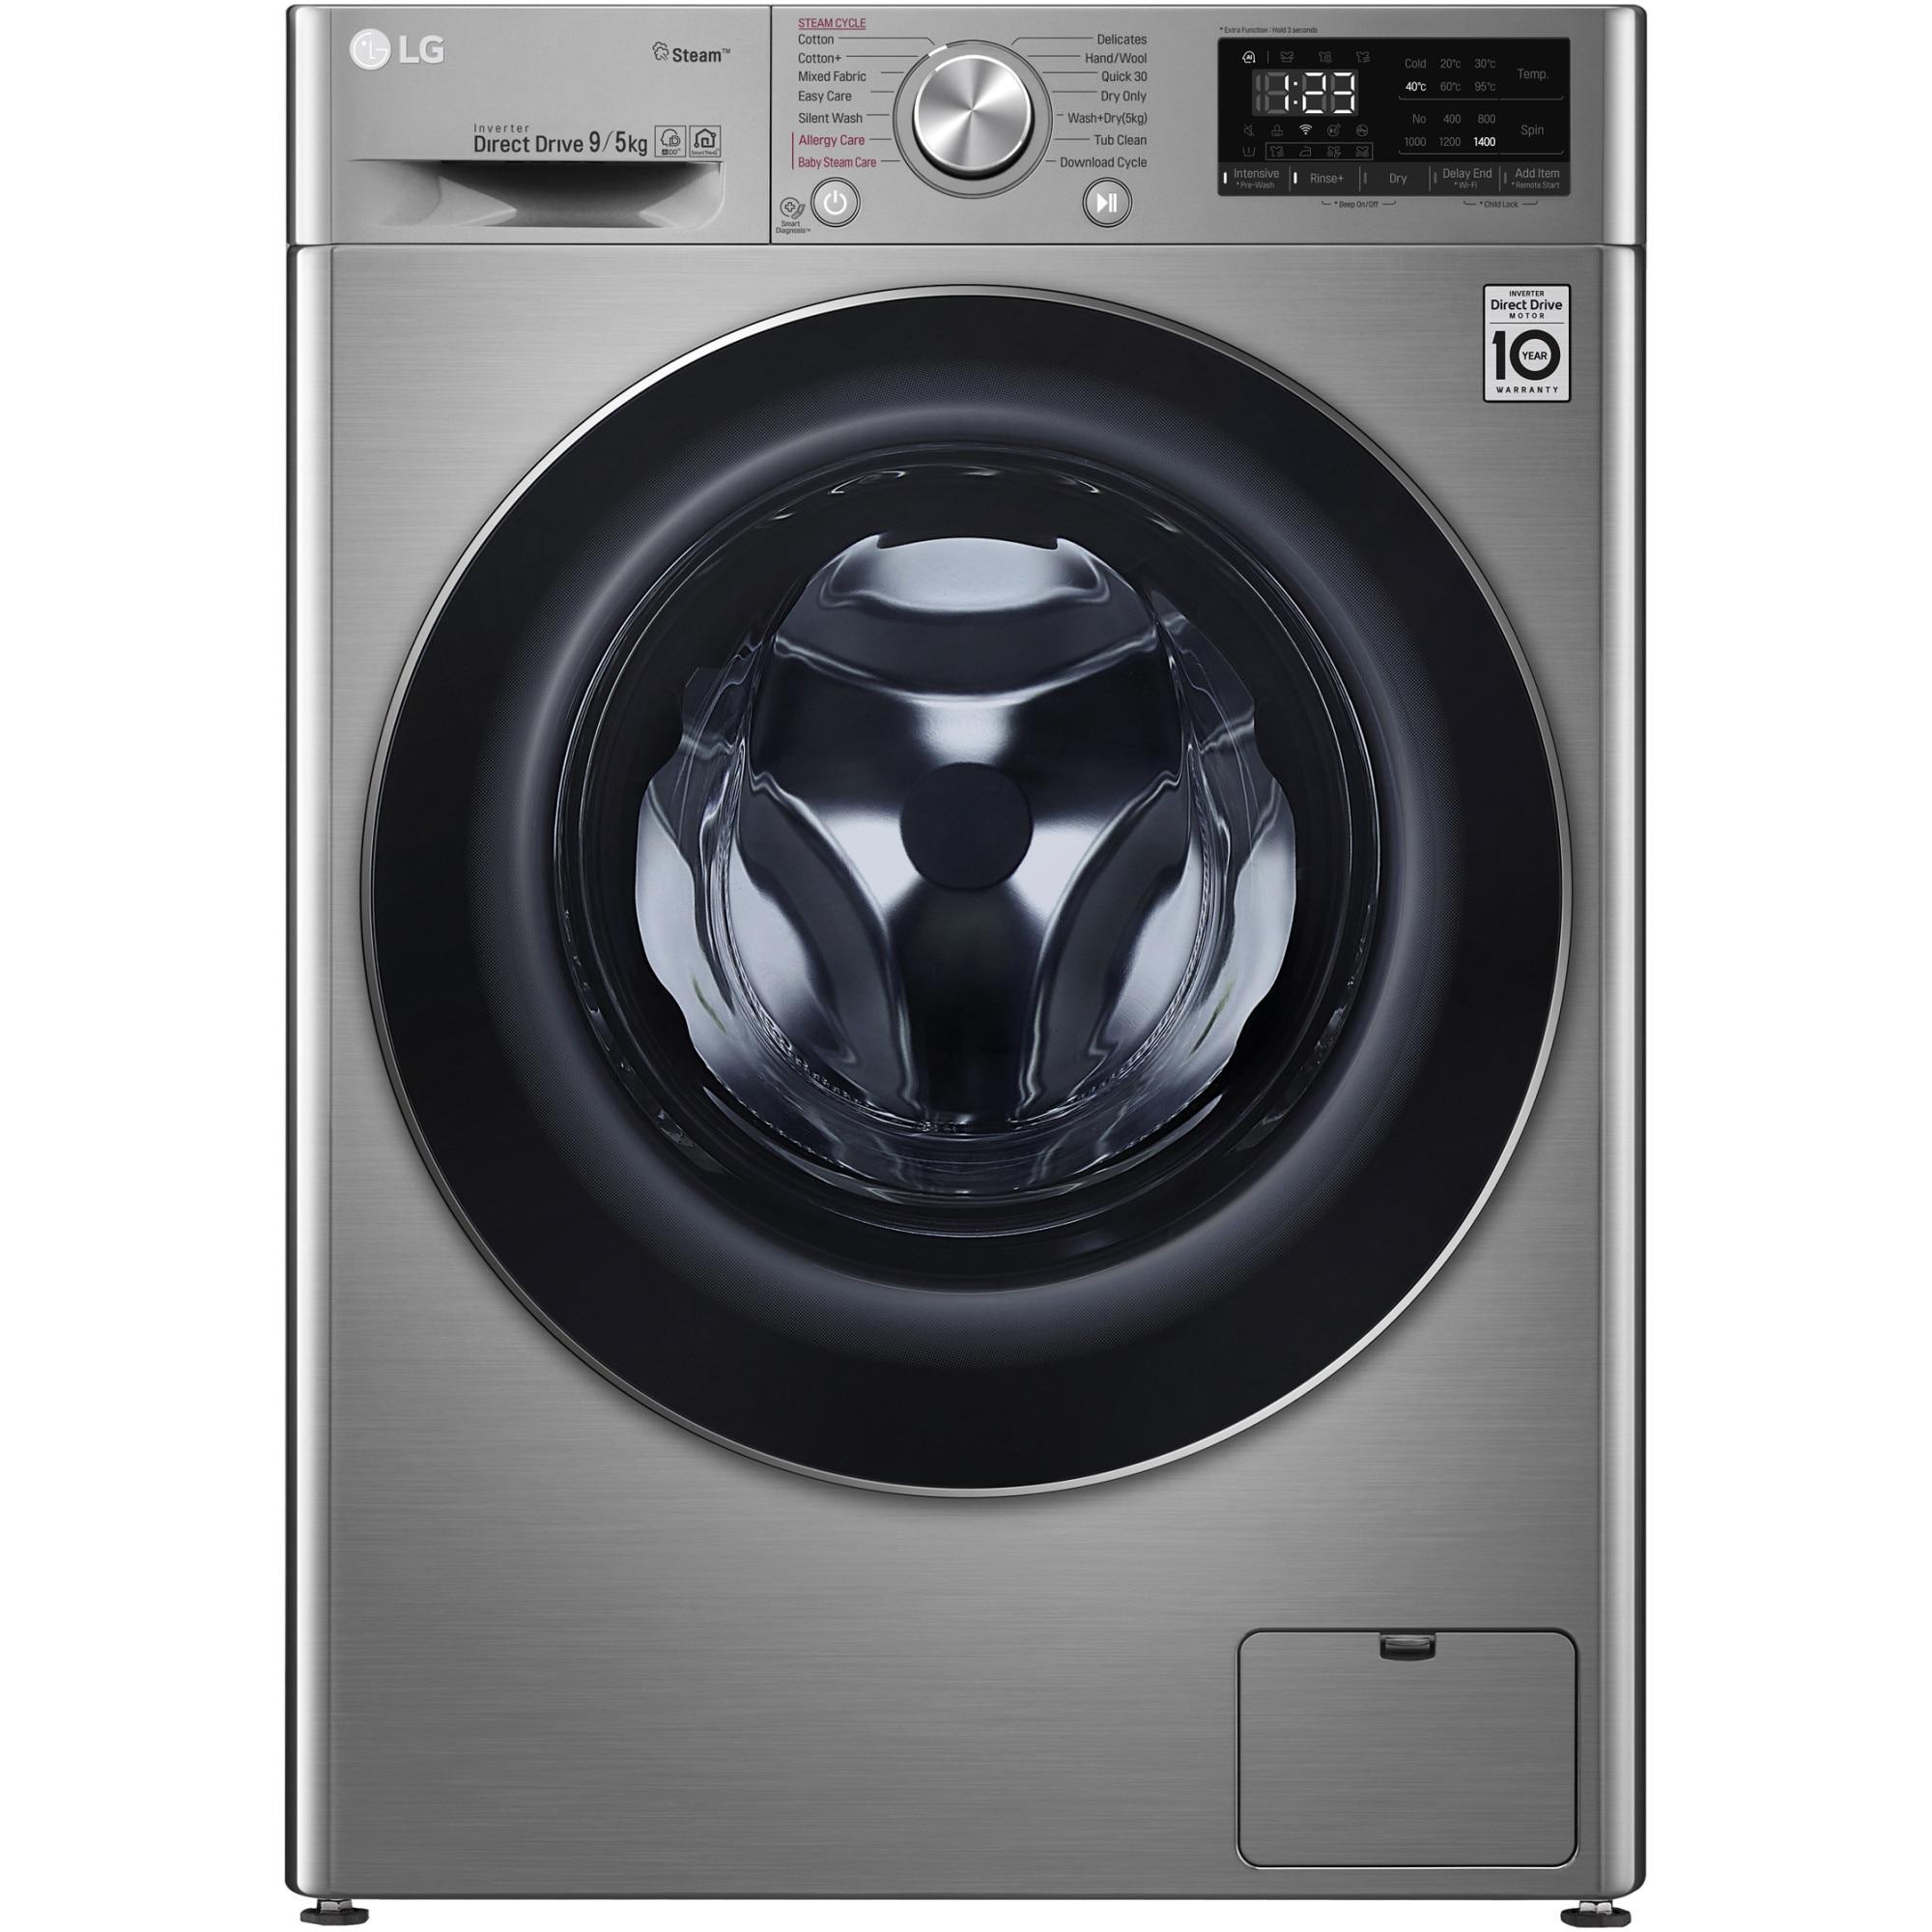 Fotografie Masina de spalat rufe cu uscator LG F4DN409S2T, Spa Steam, 1400 RPM, Spalare 9 kg / Uscare 5 kg, Clasa A, Motor AI Direct Drive, Smart Diagnosis, WiFi, Argintiu